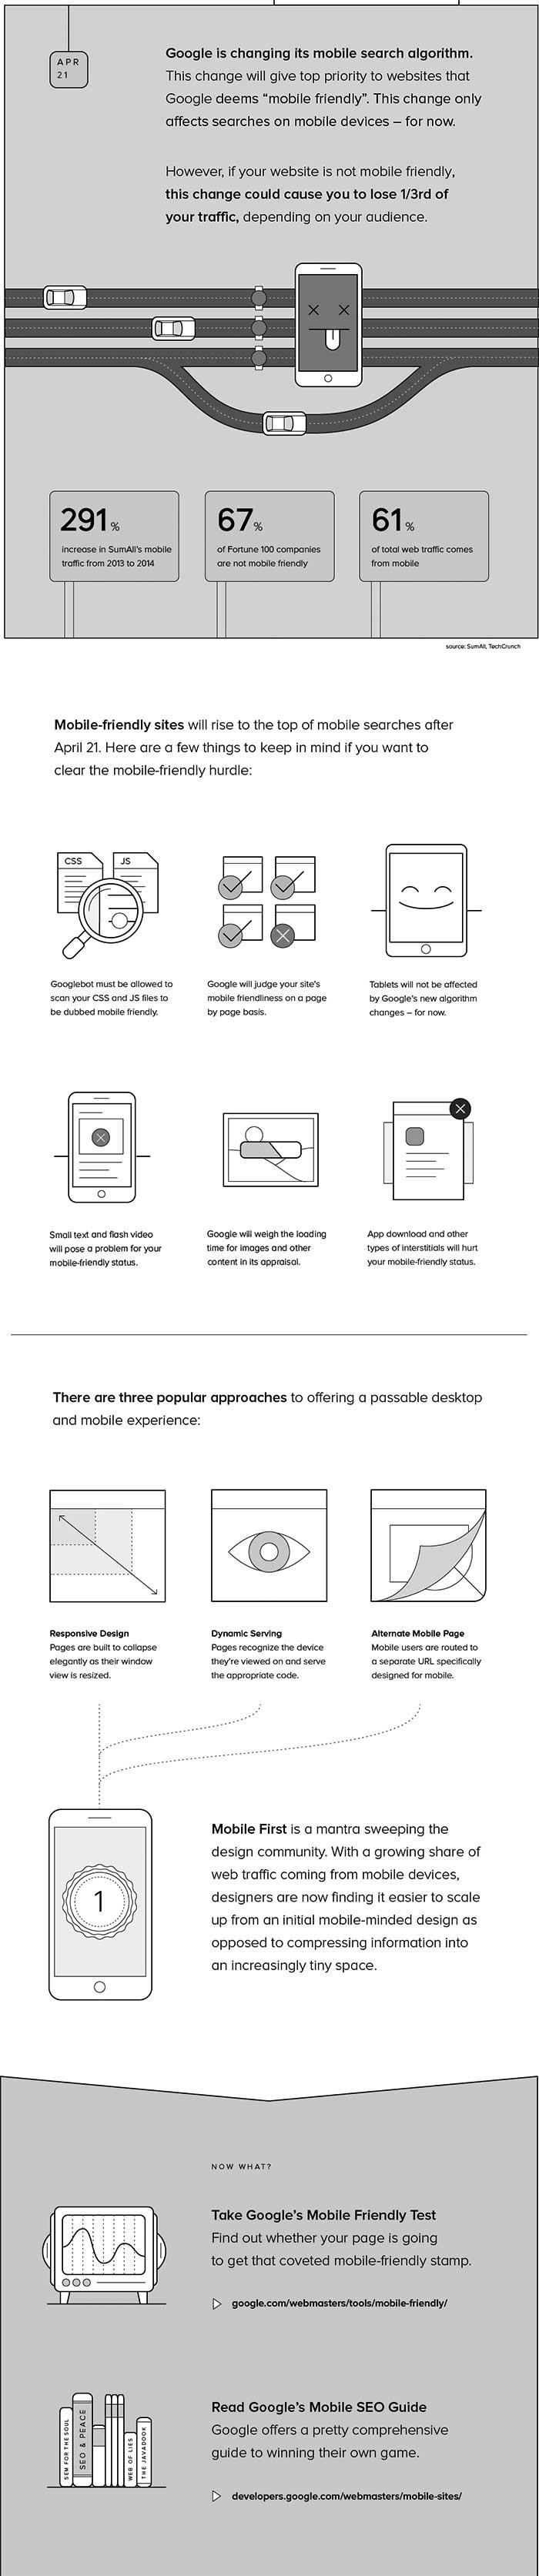 Google Mobile Update April 21 2015